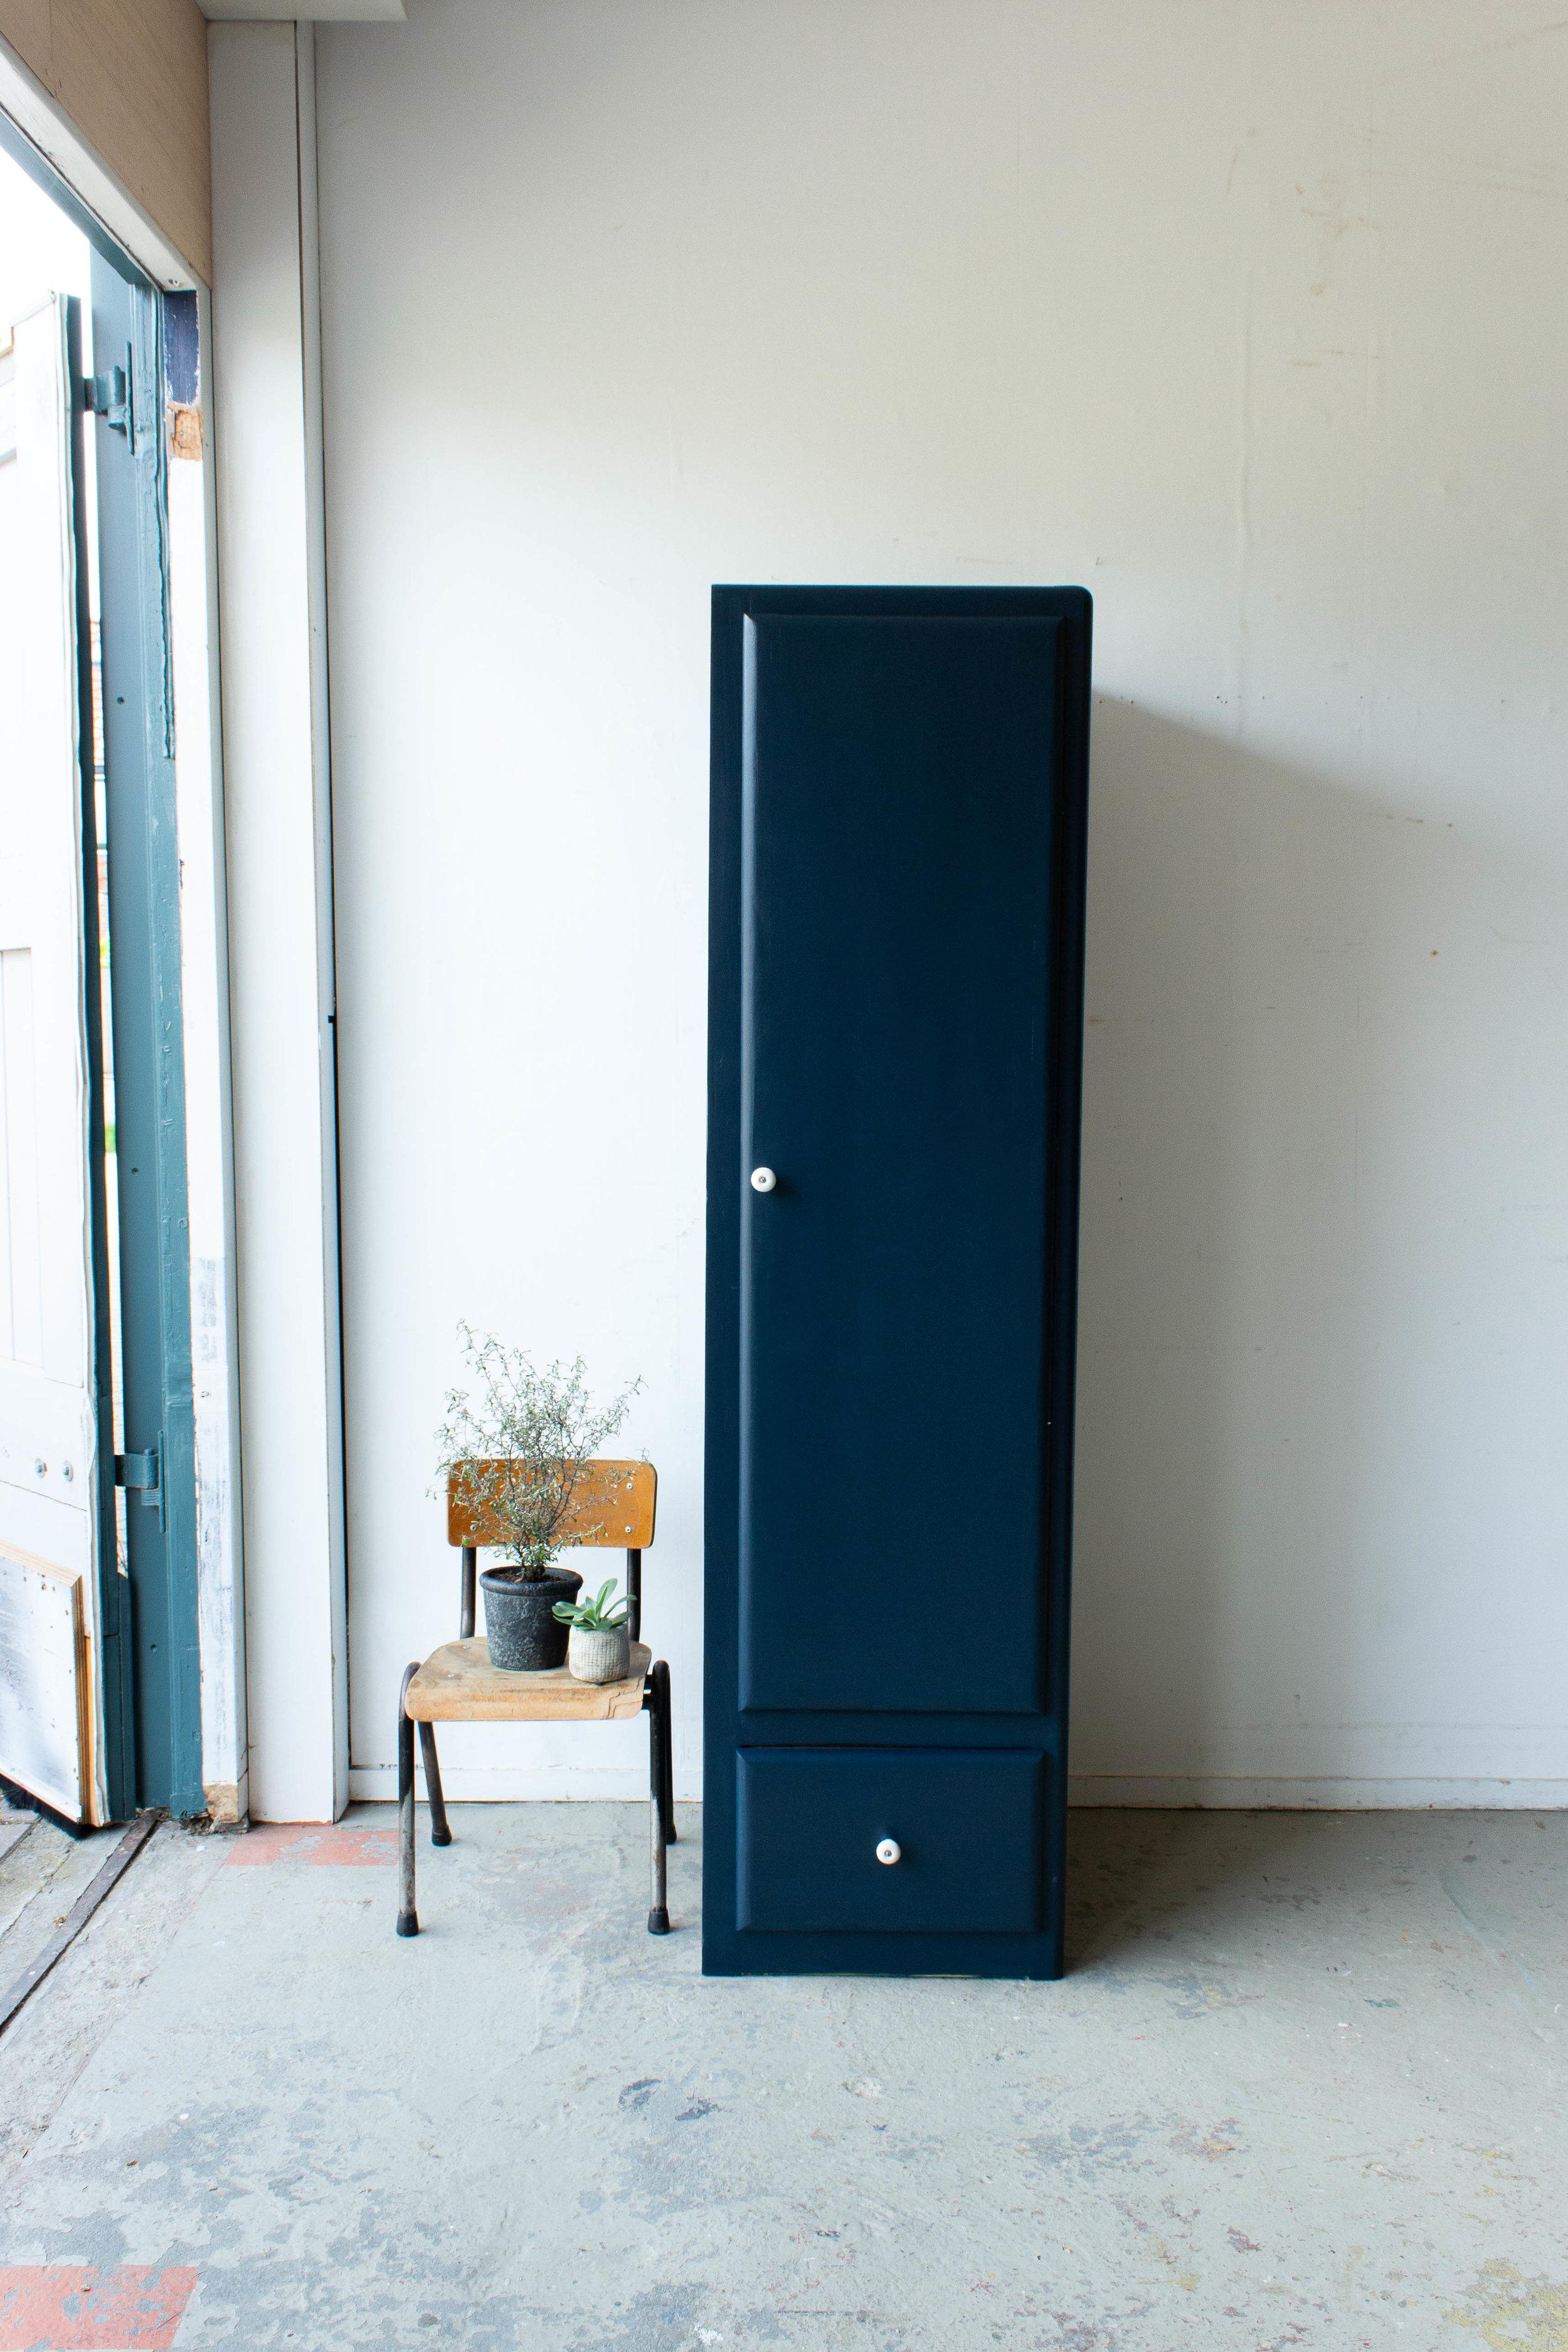 1456 - Nachtblauwe smalle keukenkast-6.jpg